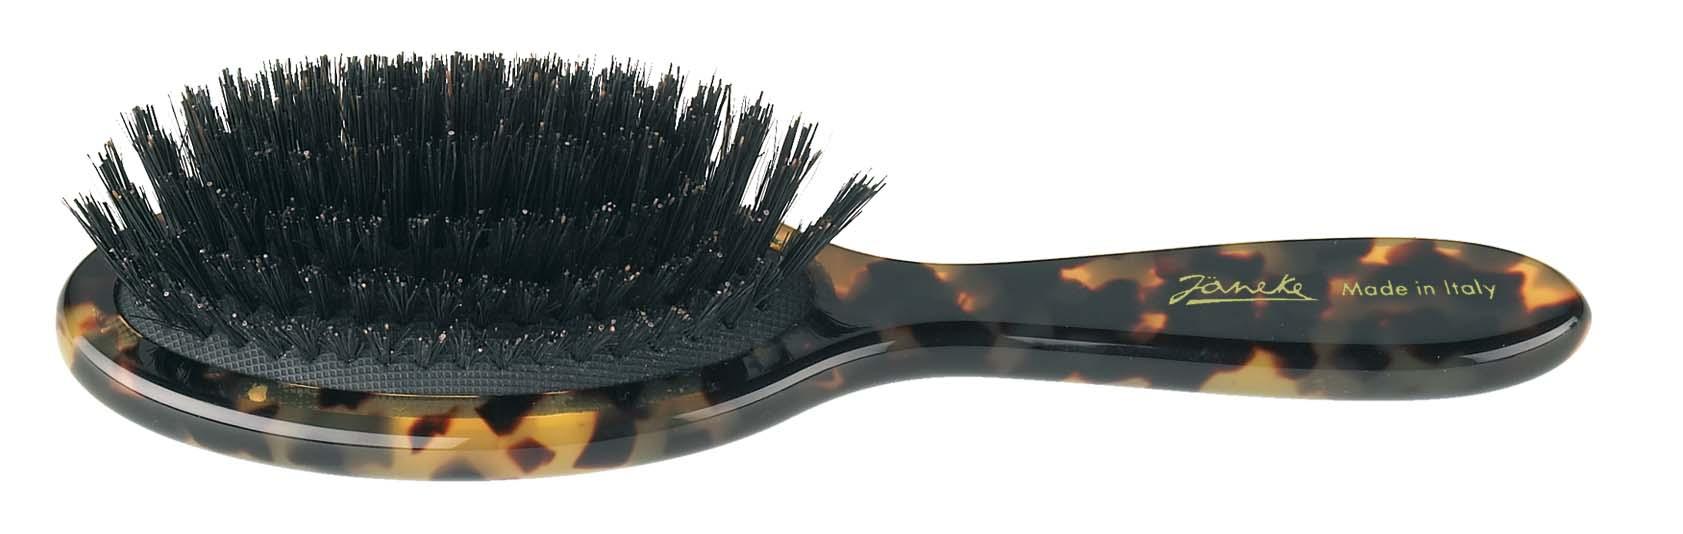 Spotted handbag brush with bristles Cod. 27213S